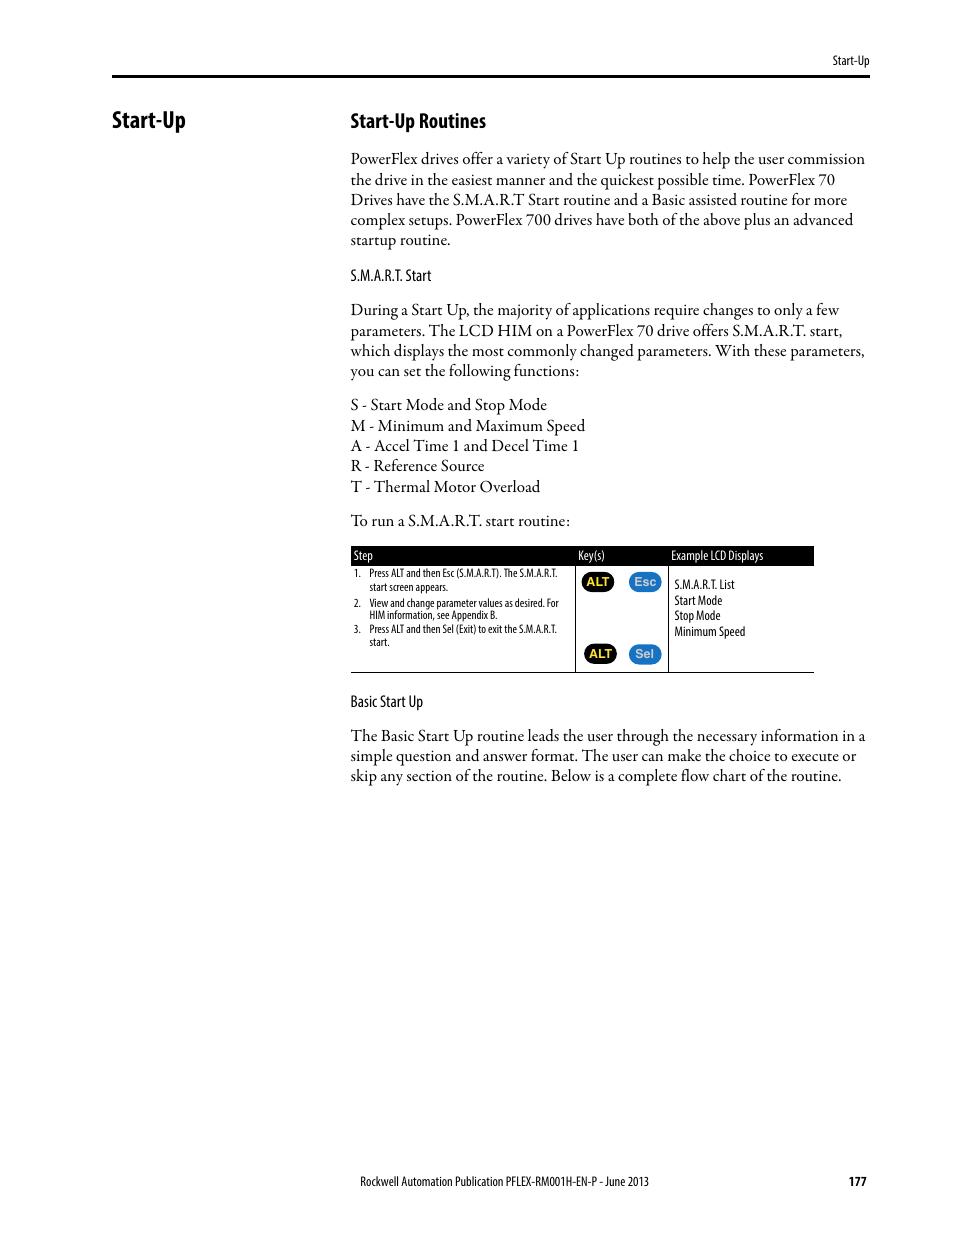 Allen Bradley Powerflex 753 Wiring Manual Schematics Data Diagram Rockwell 700 3 Wire Computer Fan